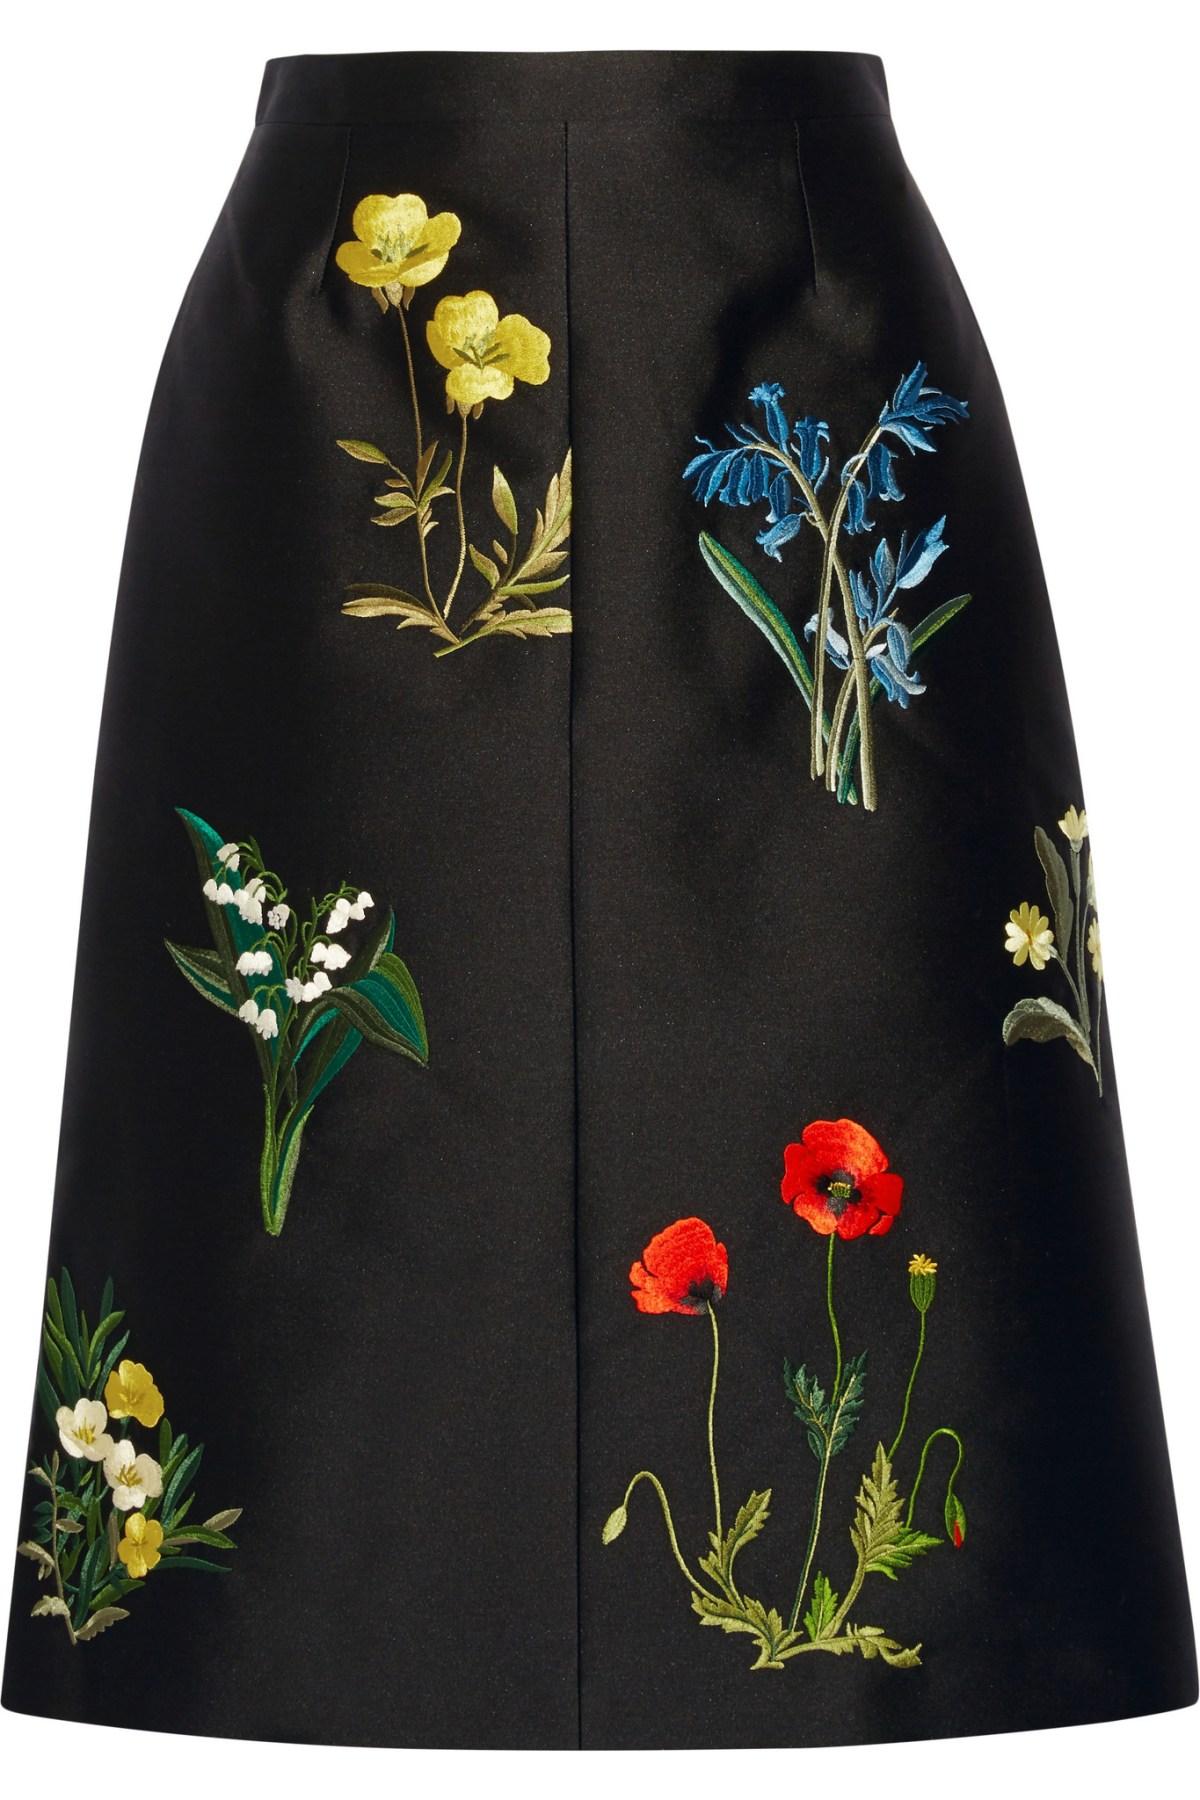 Stella McCartney | 'Renee' Embroidered Midi Skirt | Net-A-Porter